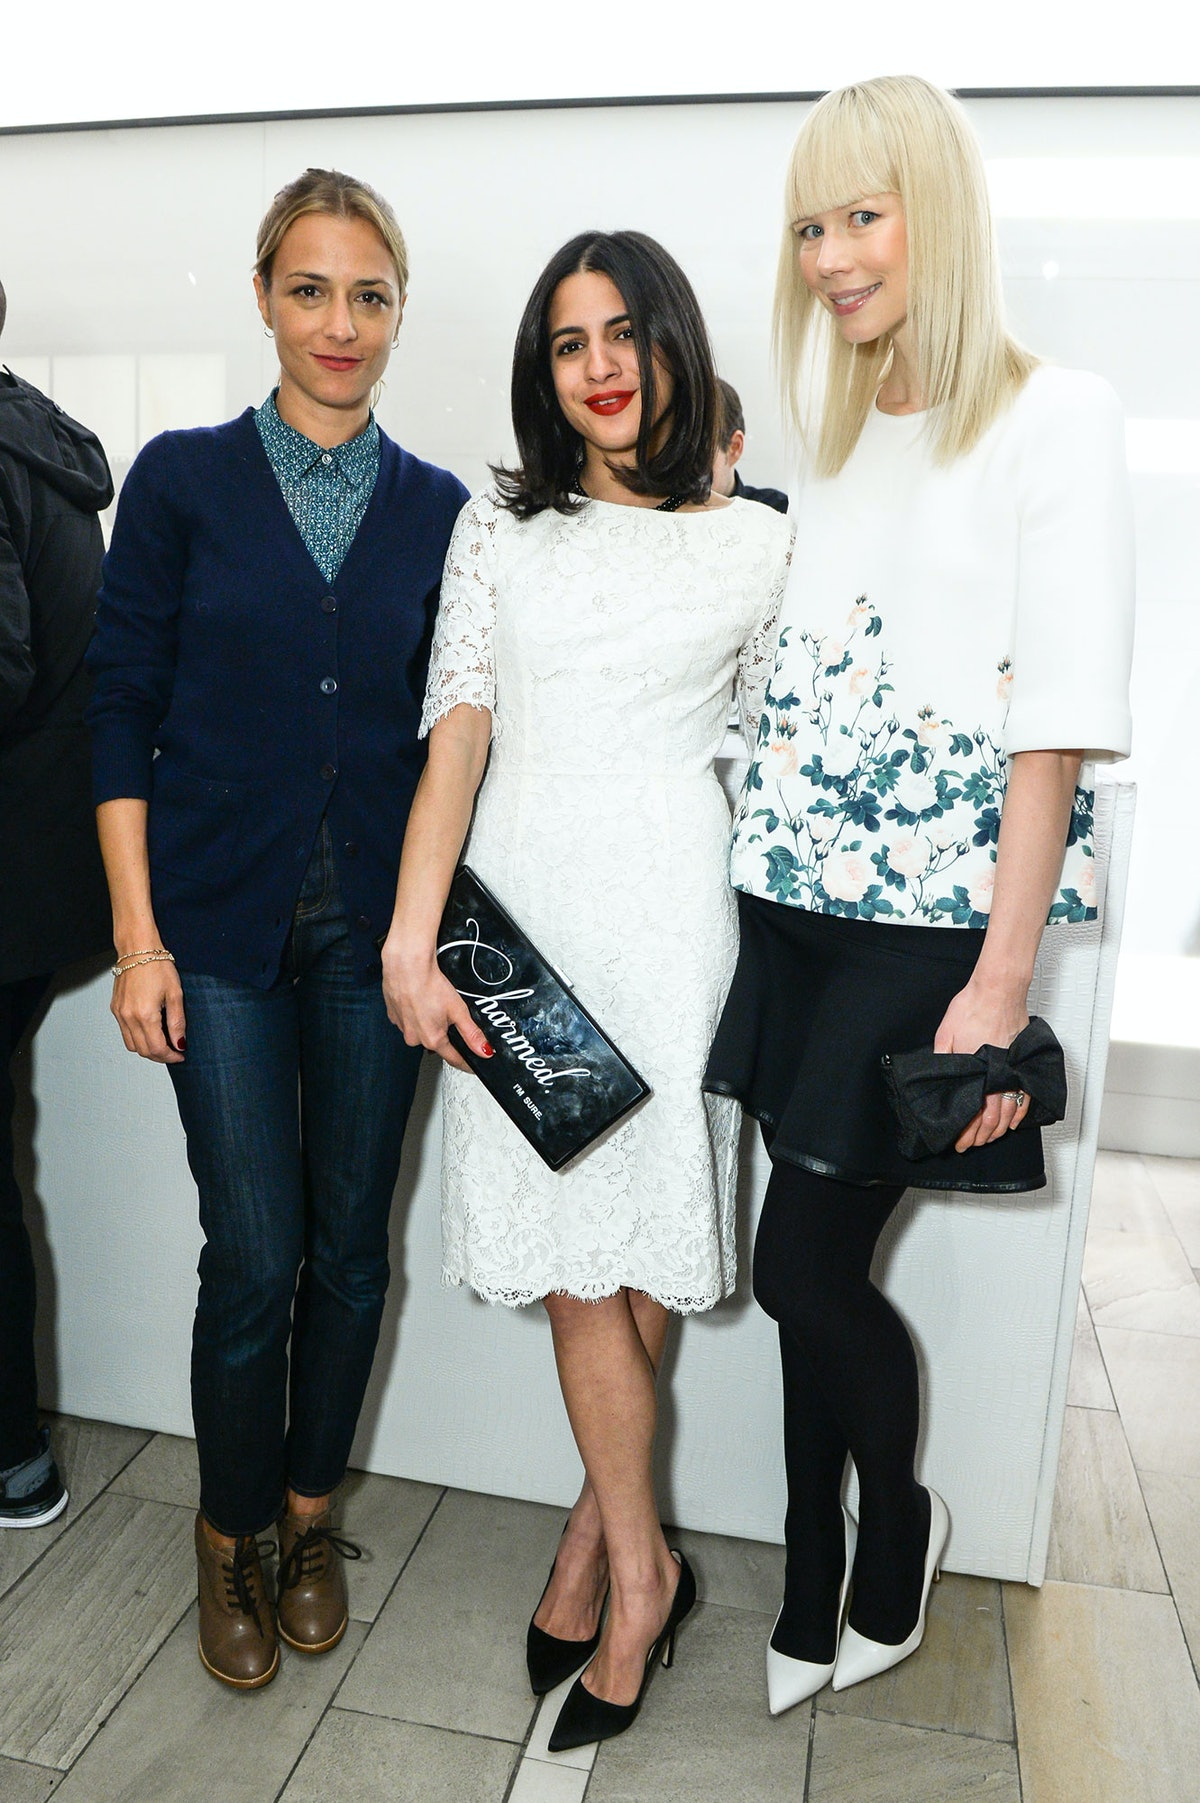 Charlotte Ronson, Haya Maraka, and Erin Fetherston